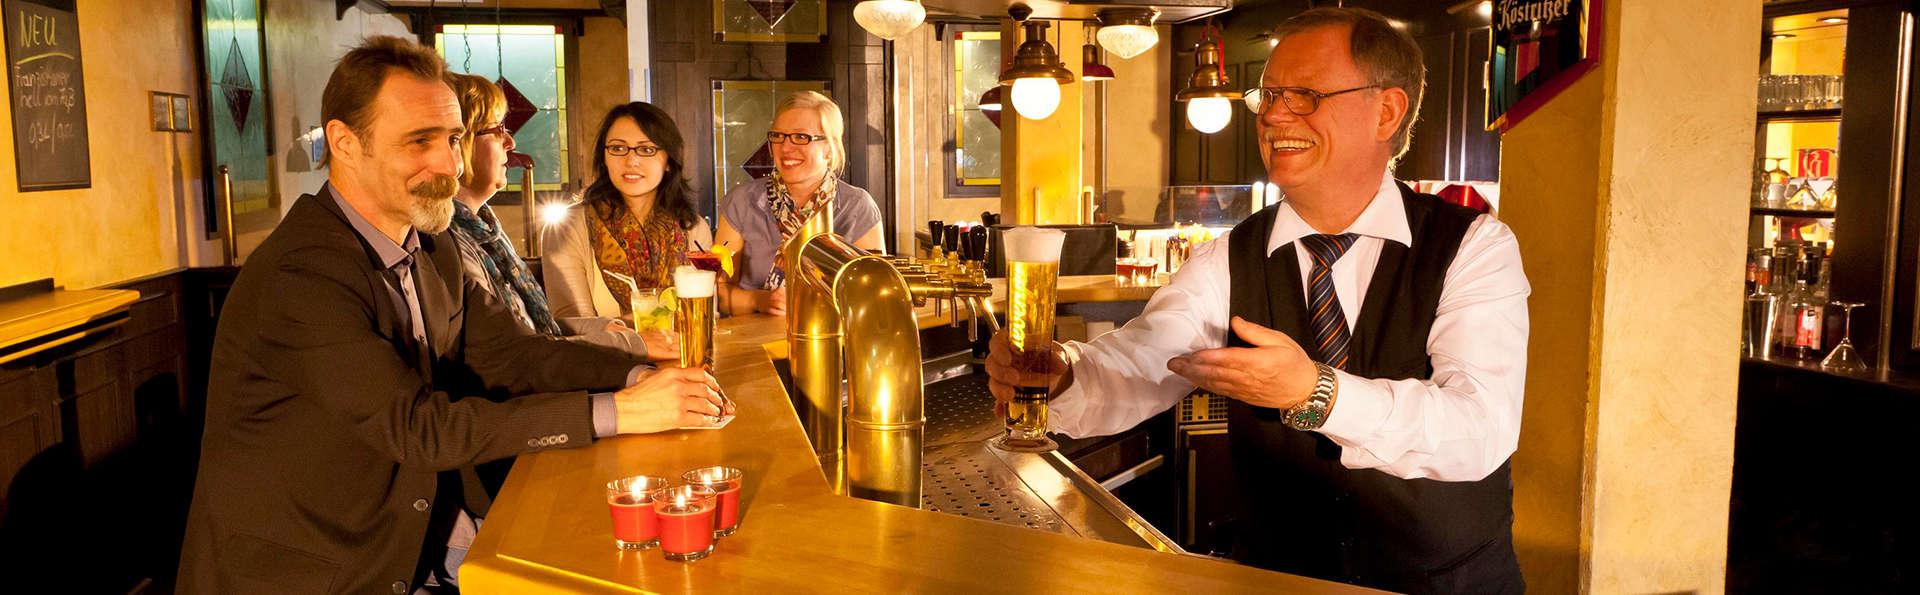 Dorint Hotel & Sportresort Arnsberg/Sauerland - Edit_Bar.jpg